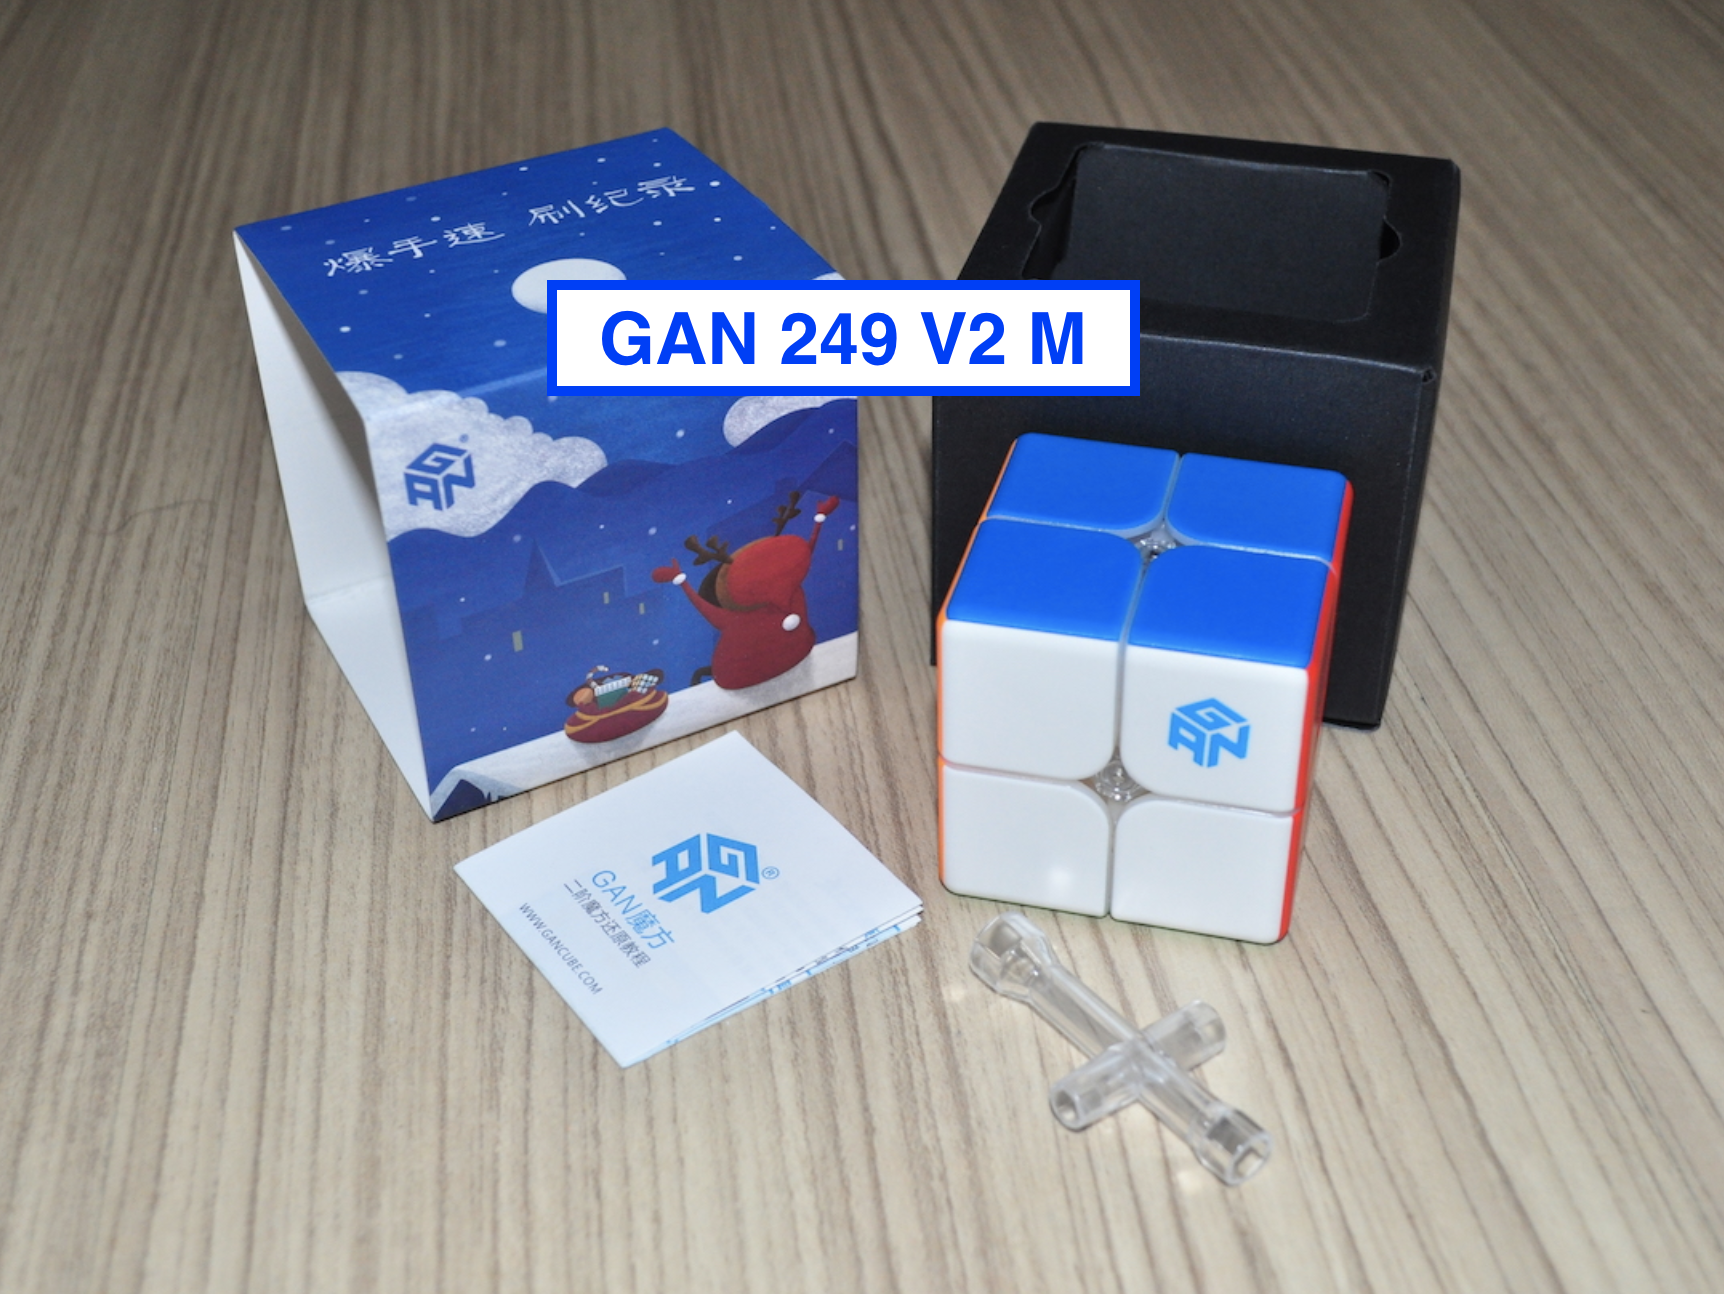 GAN 249 V2 M (*มีแม่เหล็ก*)